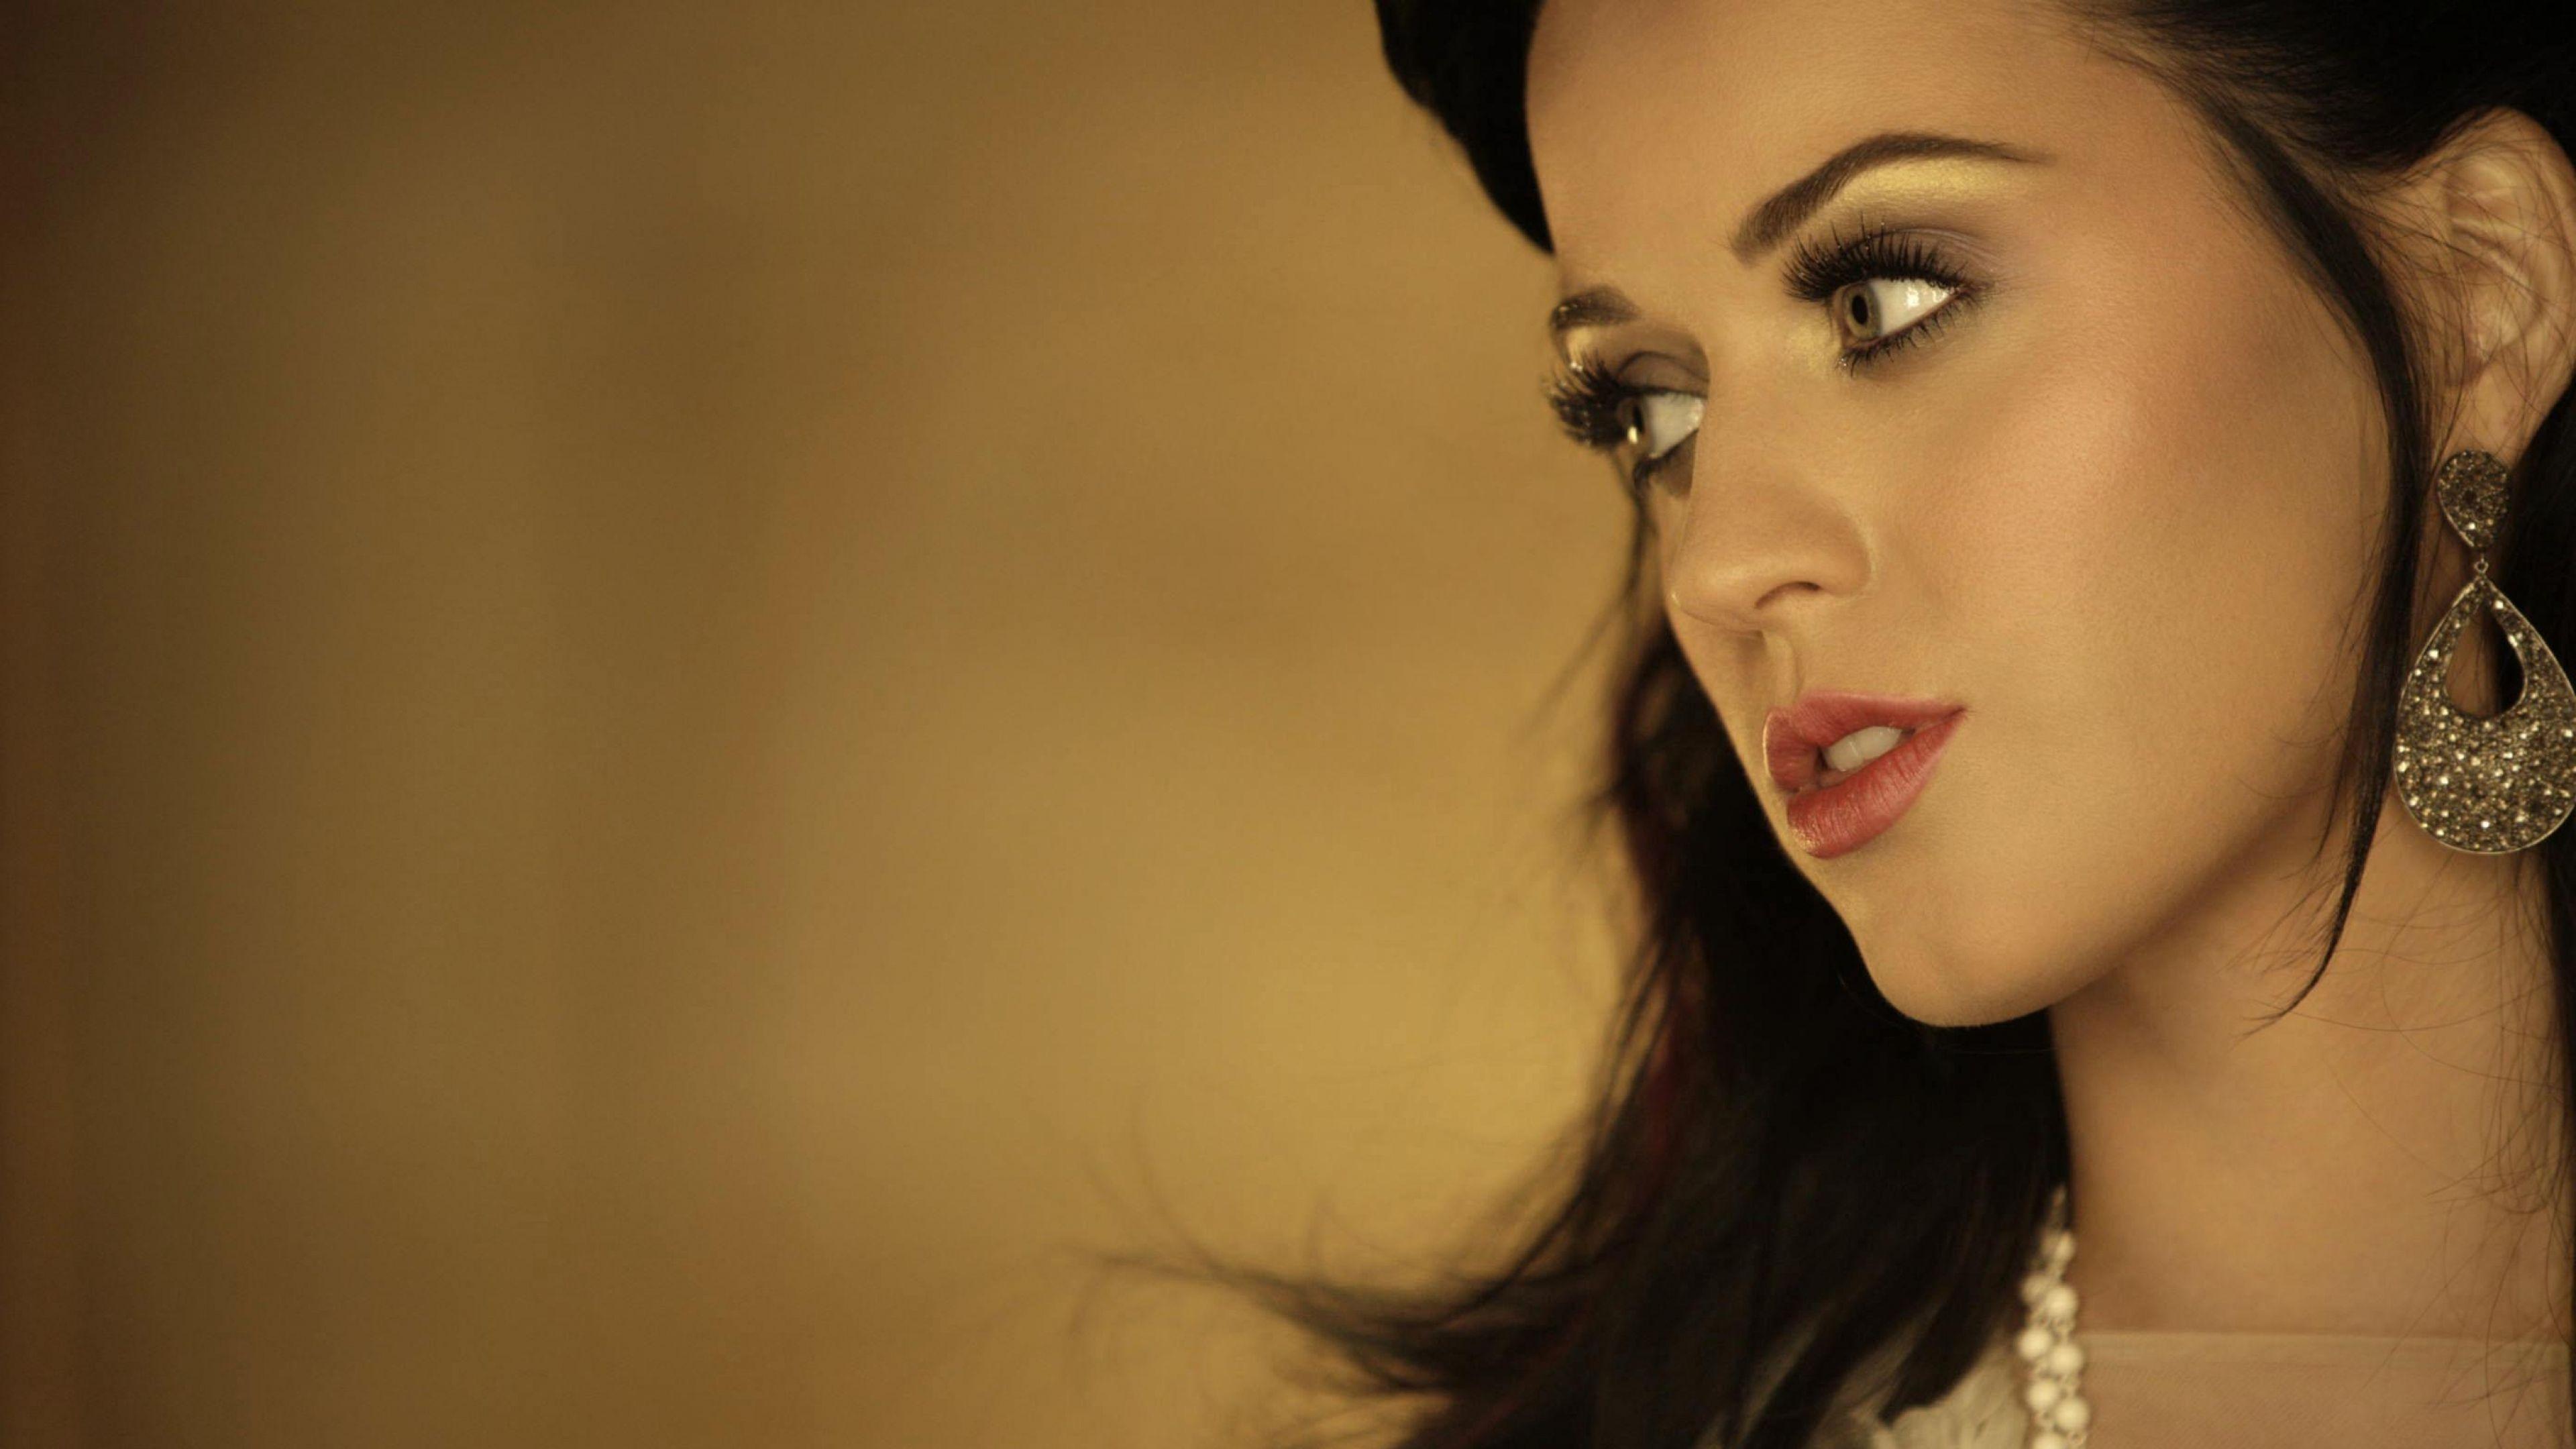 Katy Perry Wallpaper Desktop Katy Perry Wallpaper Katy